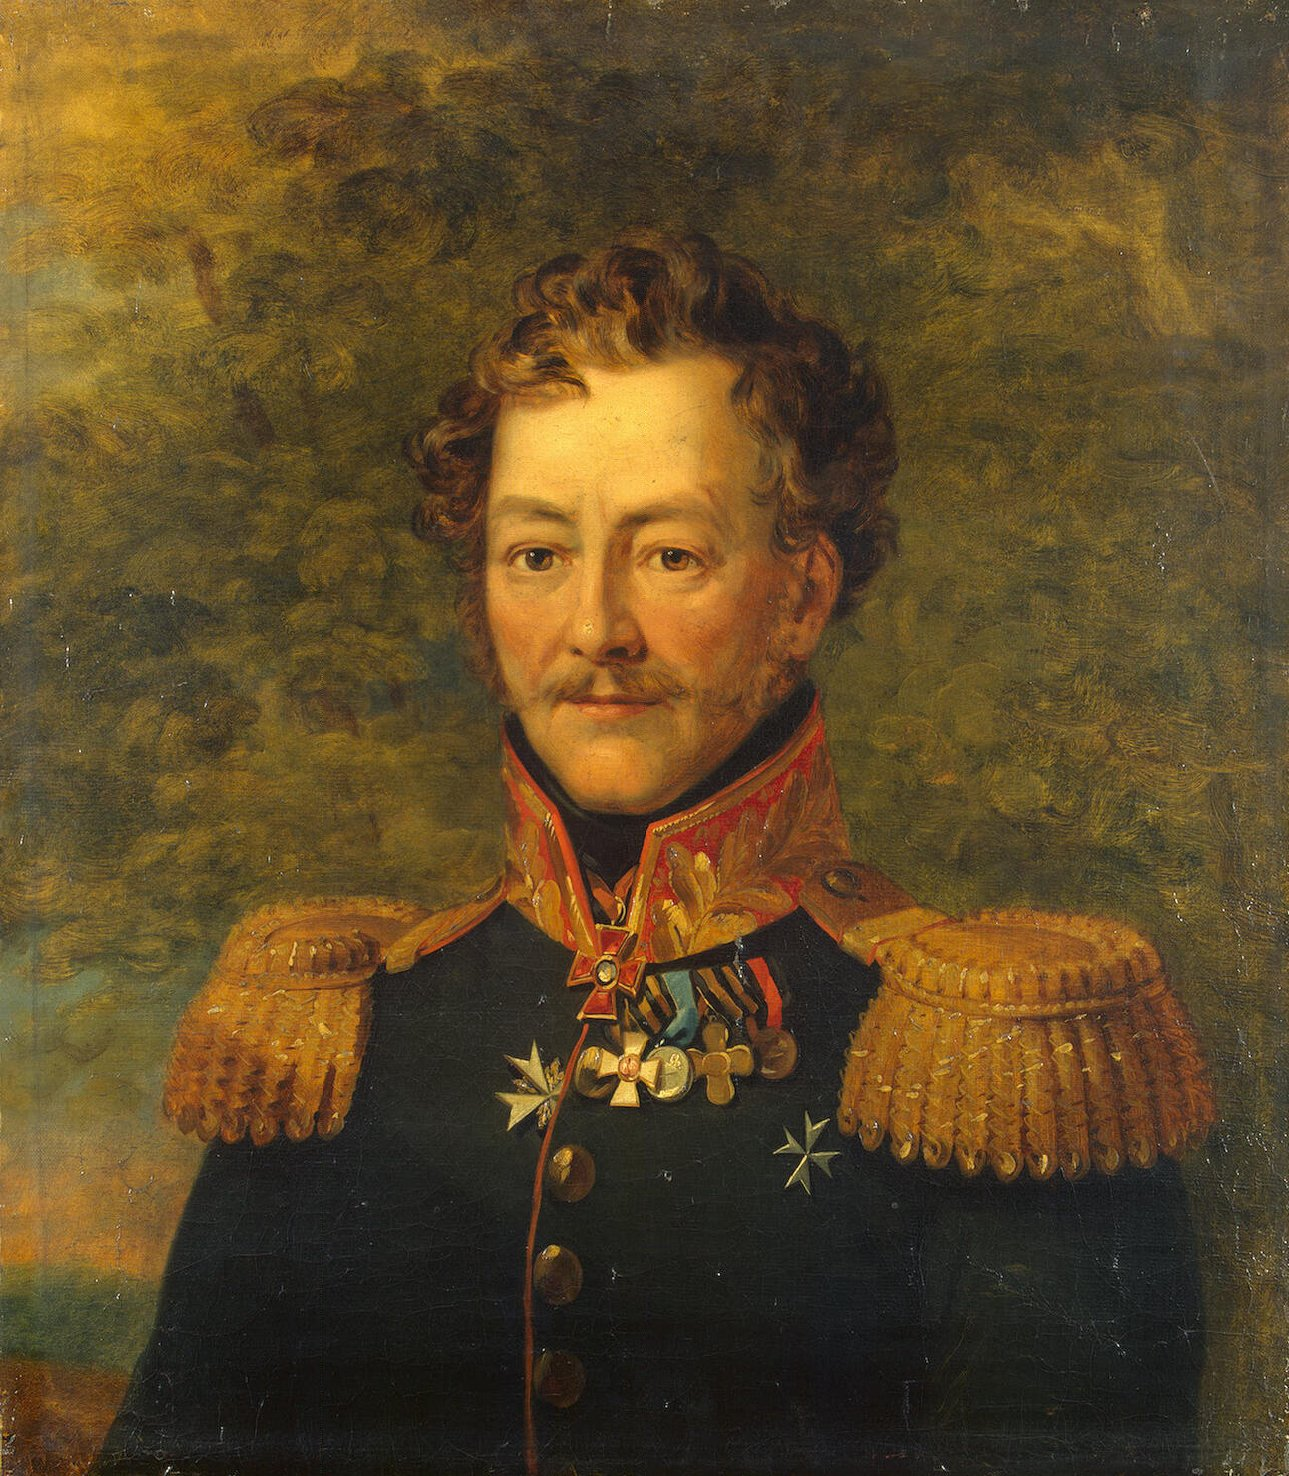 Аргамаков, Иван Васильевич